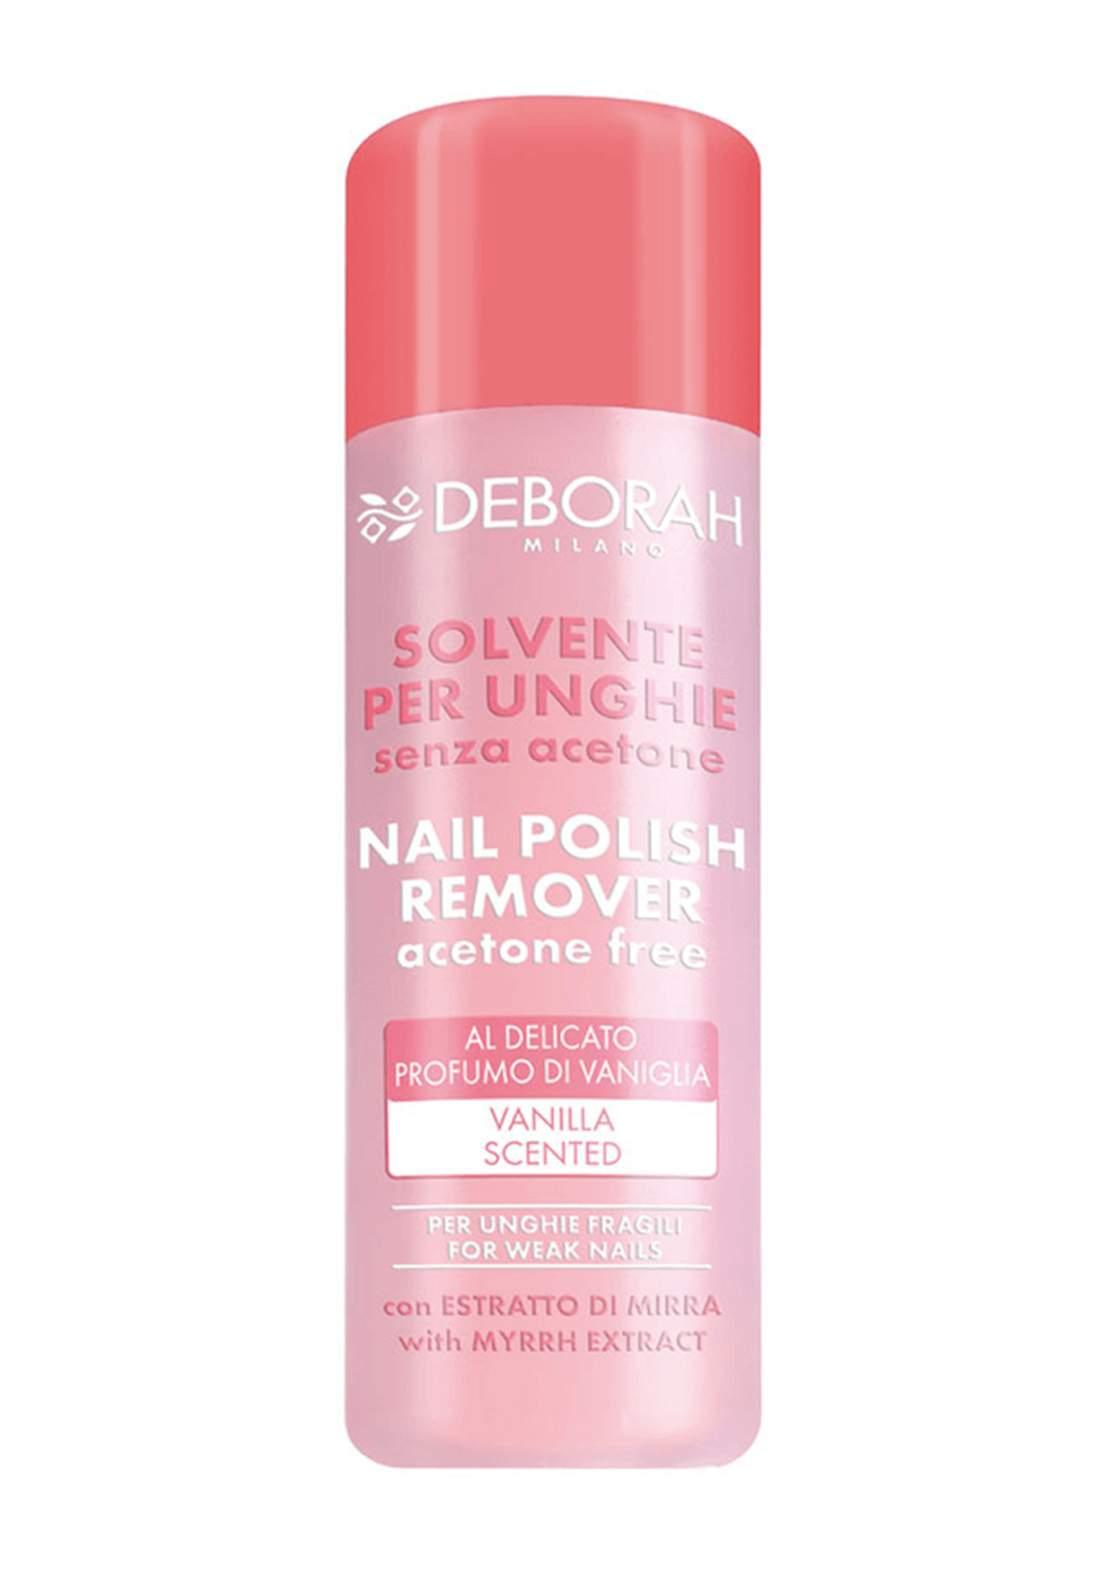 Deborah Nail Polish Remover nail polish remover  120 ml مزيل طلاء أظافر